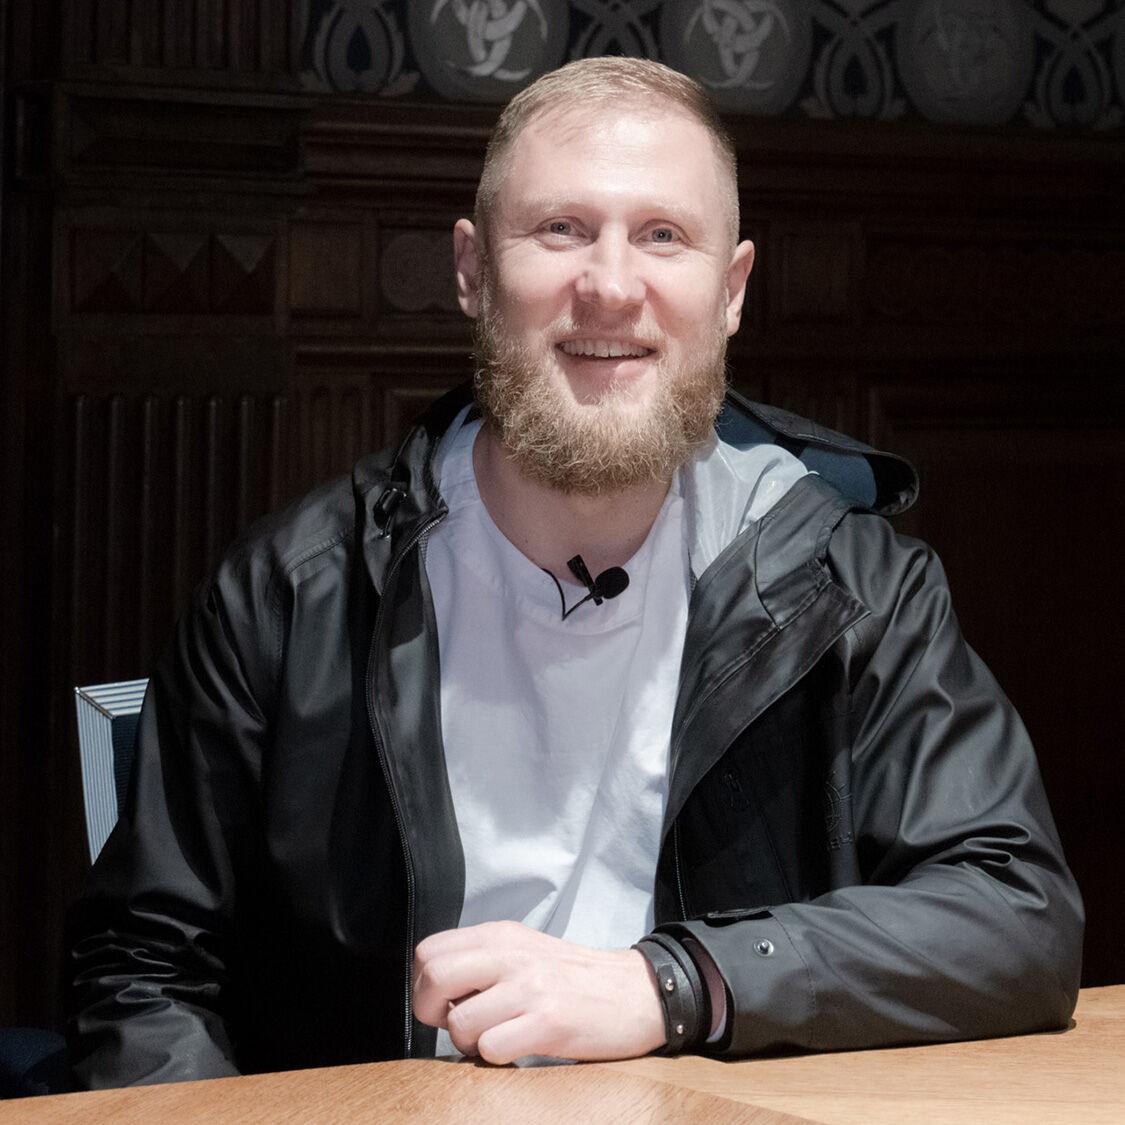 Vlad Strukov